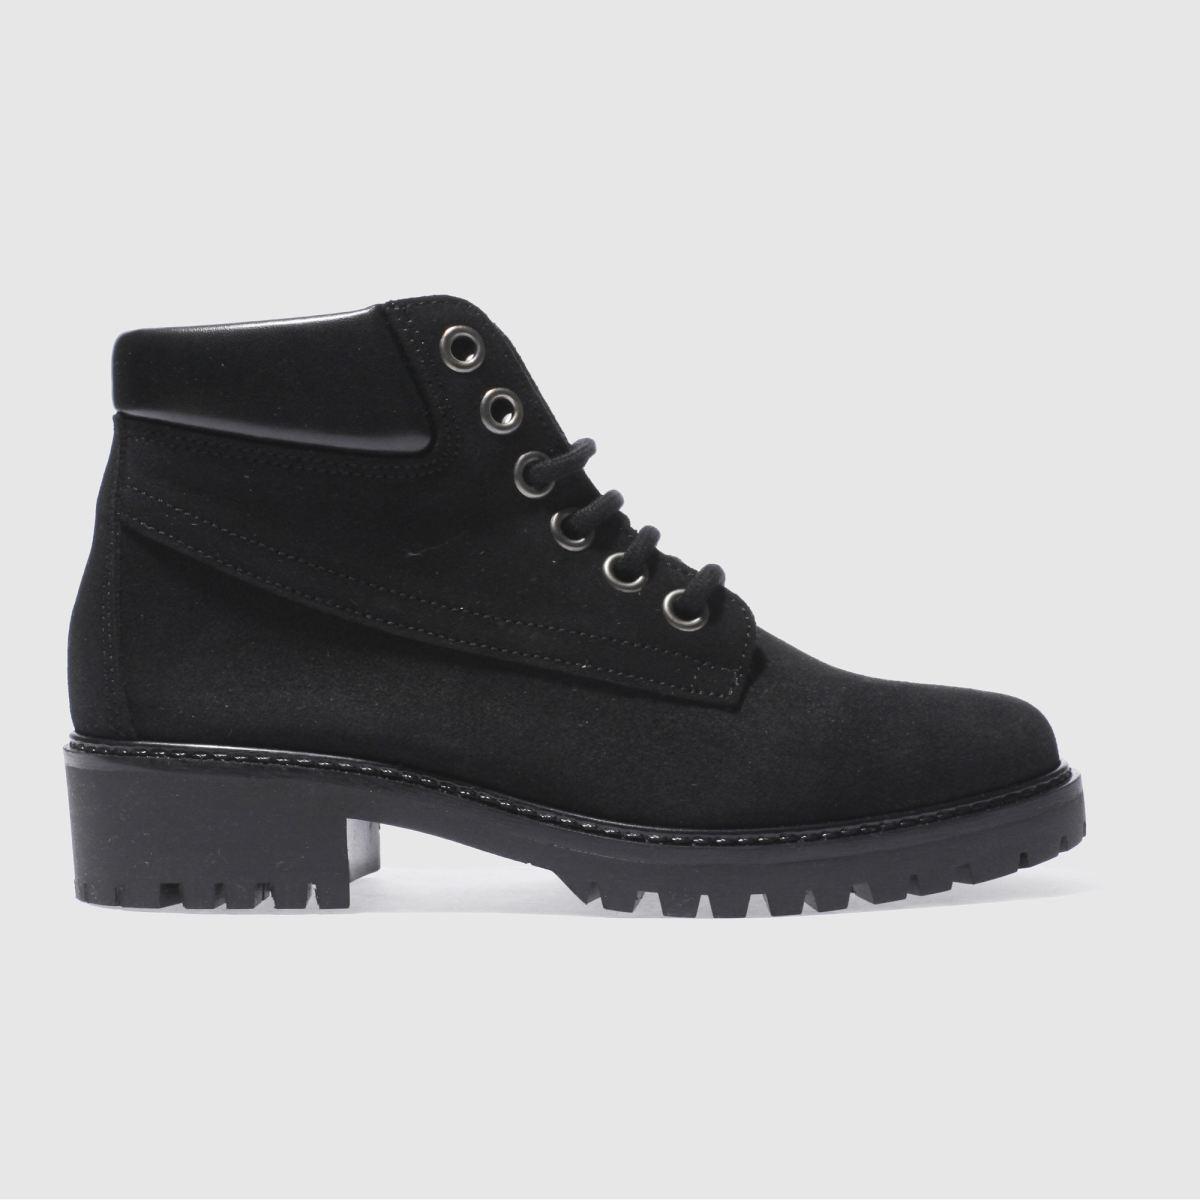 Schuh Black Climber Boots